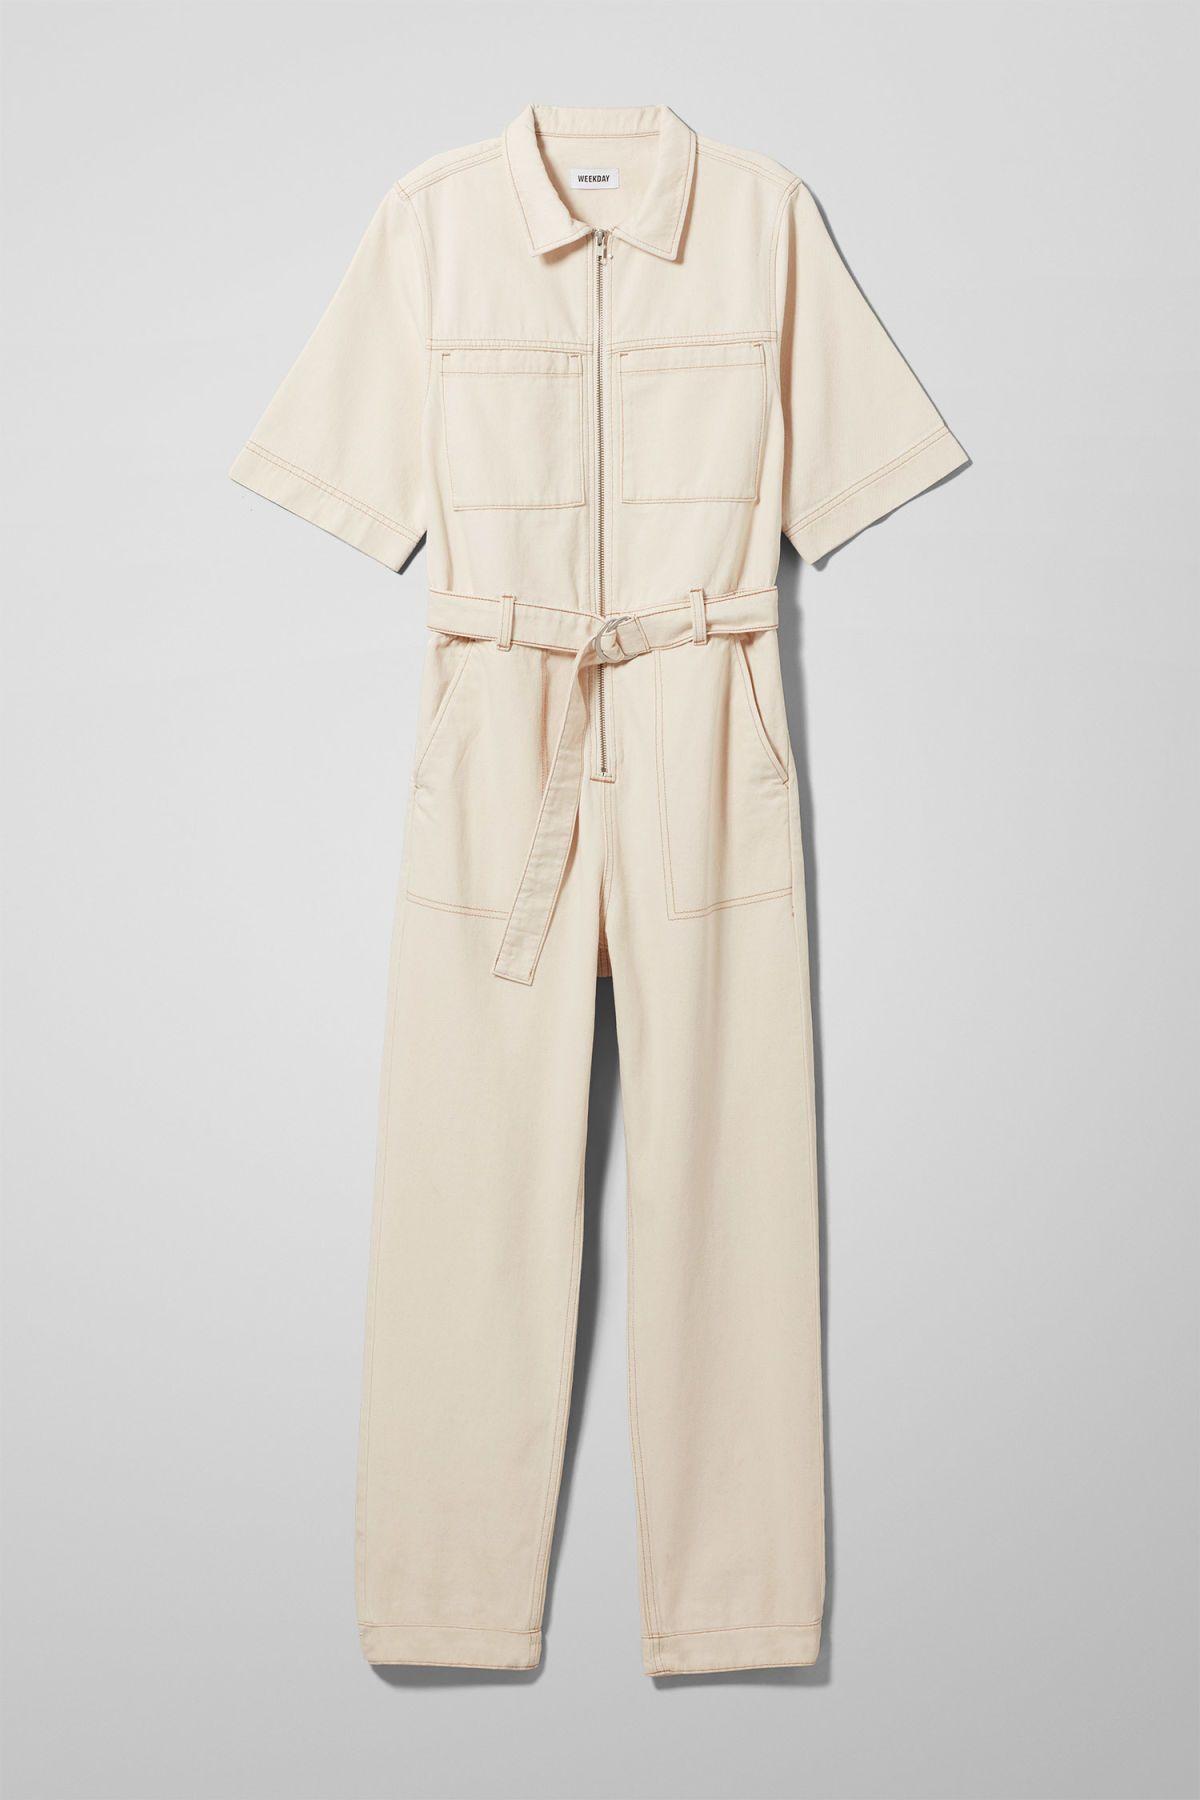 a9eda32850b Petrol Denim Boiler is a workwear-style jumpsuit cut from rigid organic  cotton in ecru. Designed with straight